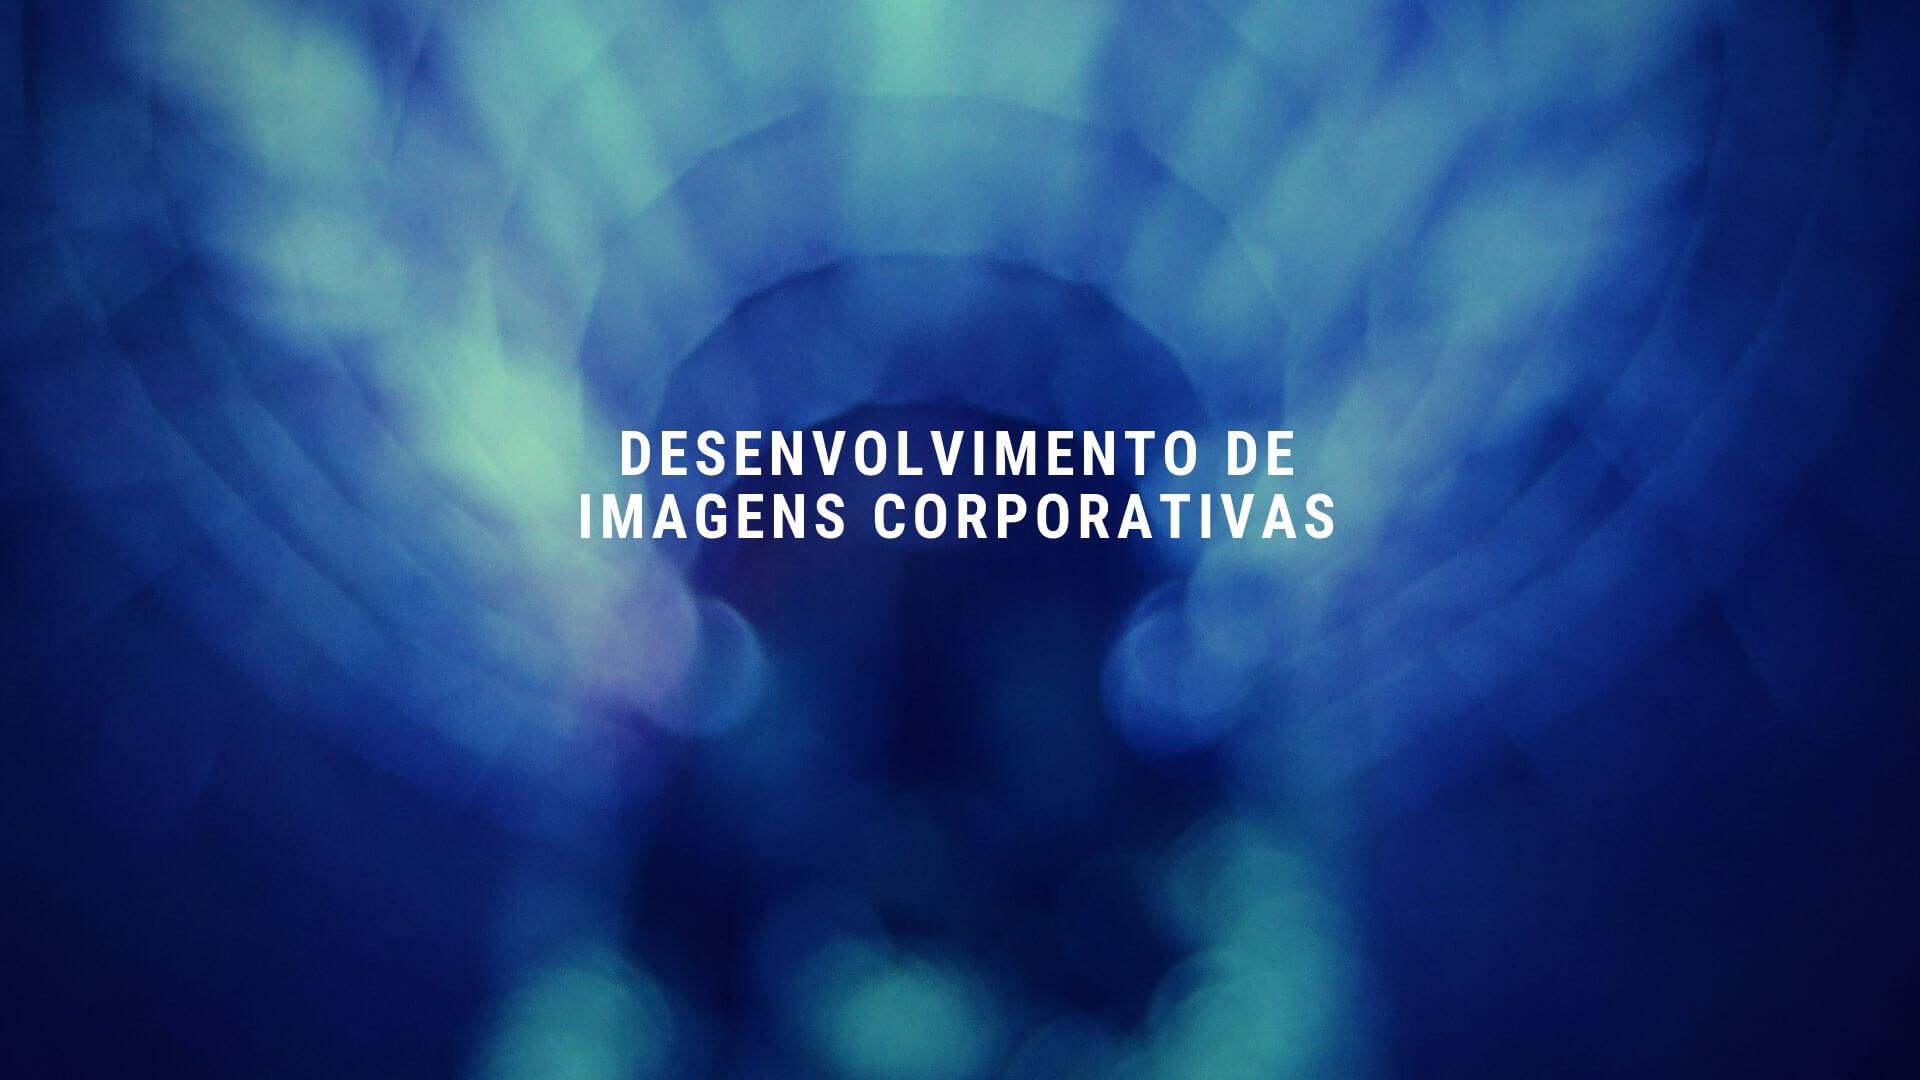 redes-imagens-corporativas